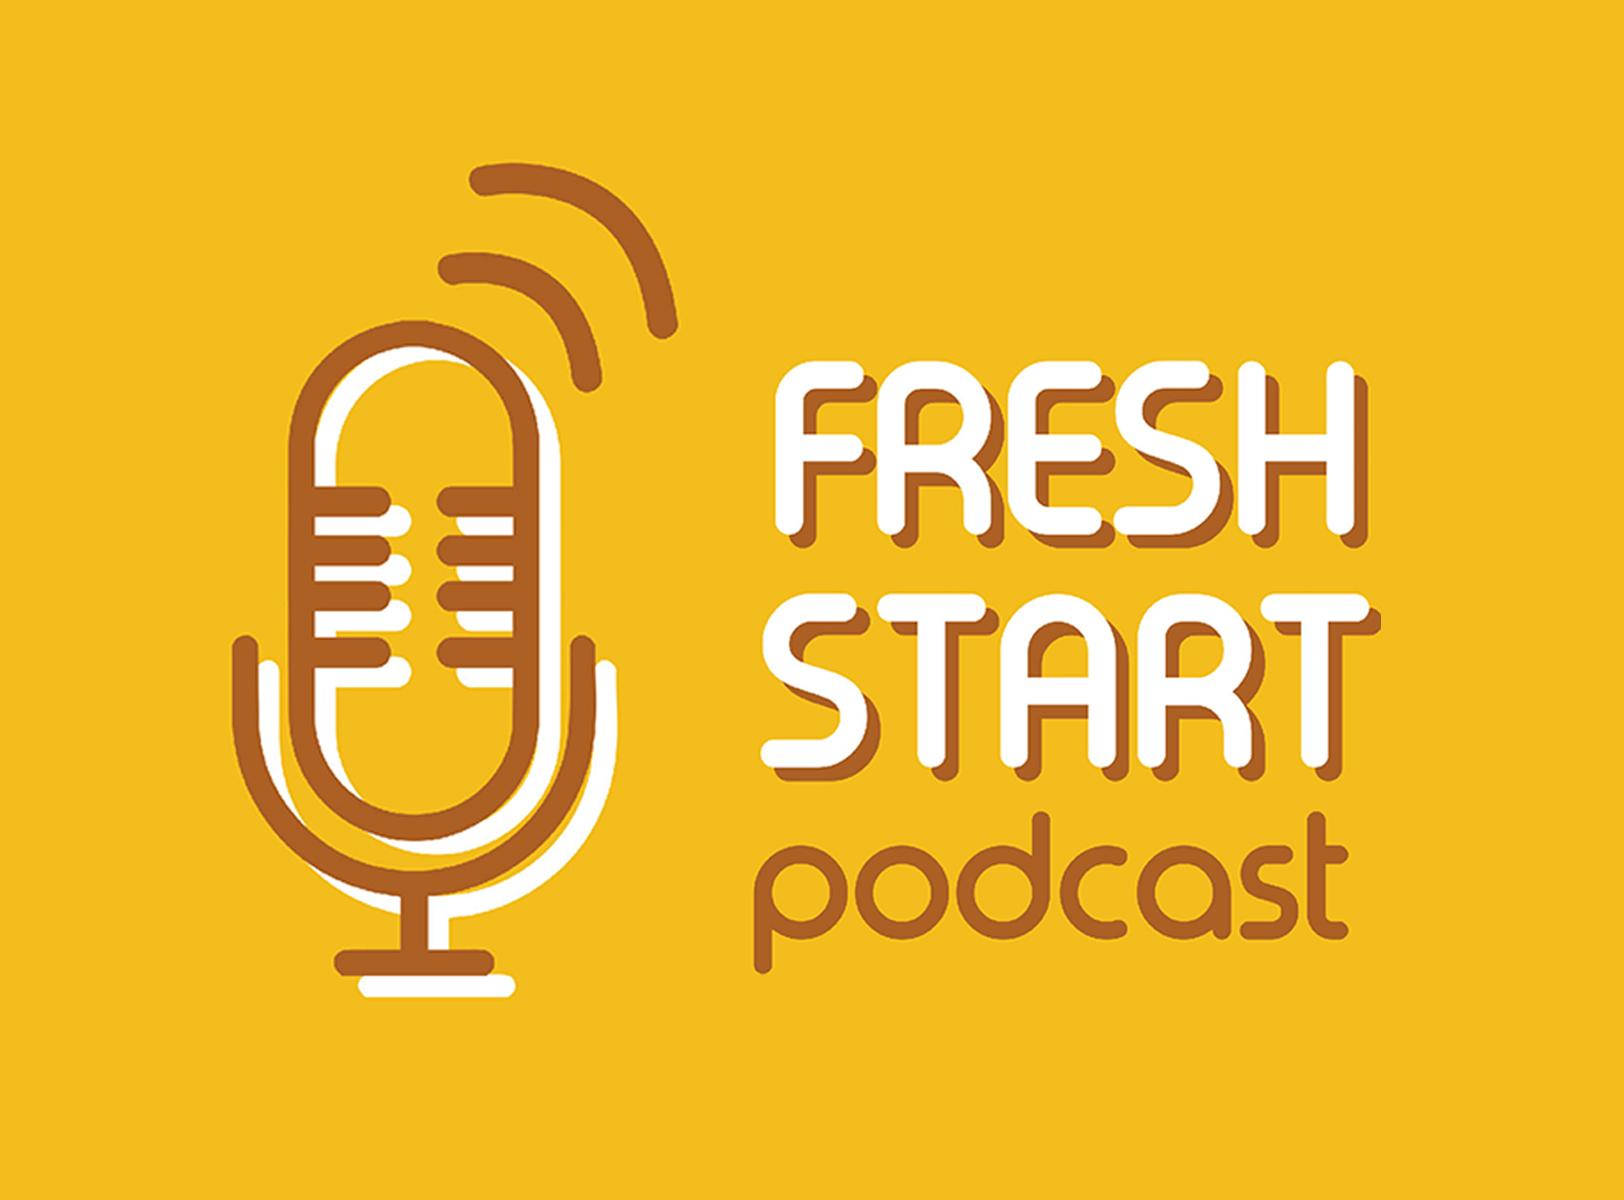 Fresh Start: Podcast News (4/25/2019 Thu.)